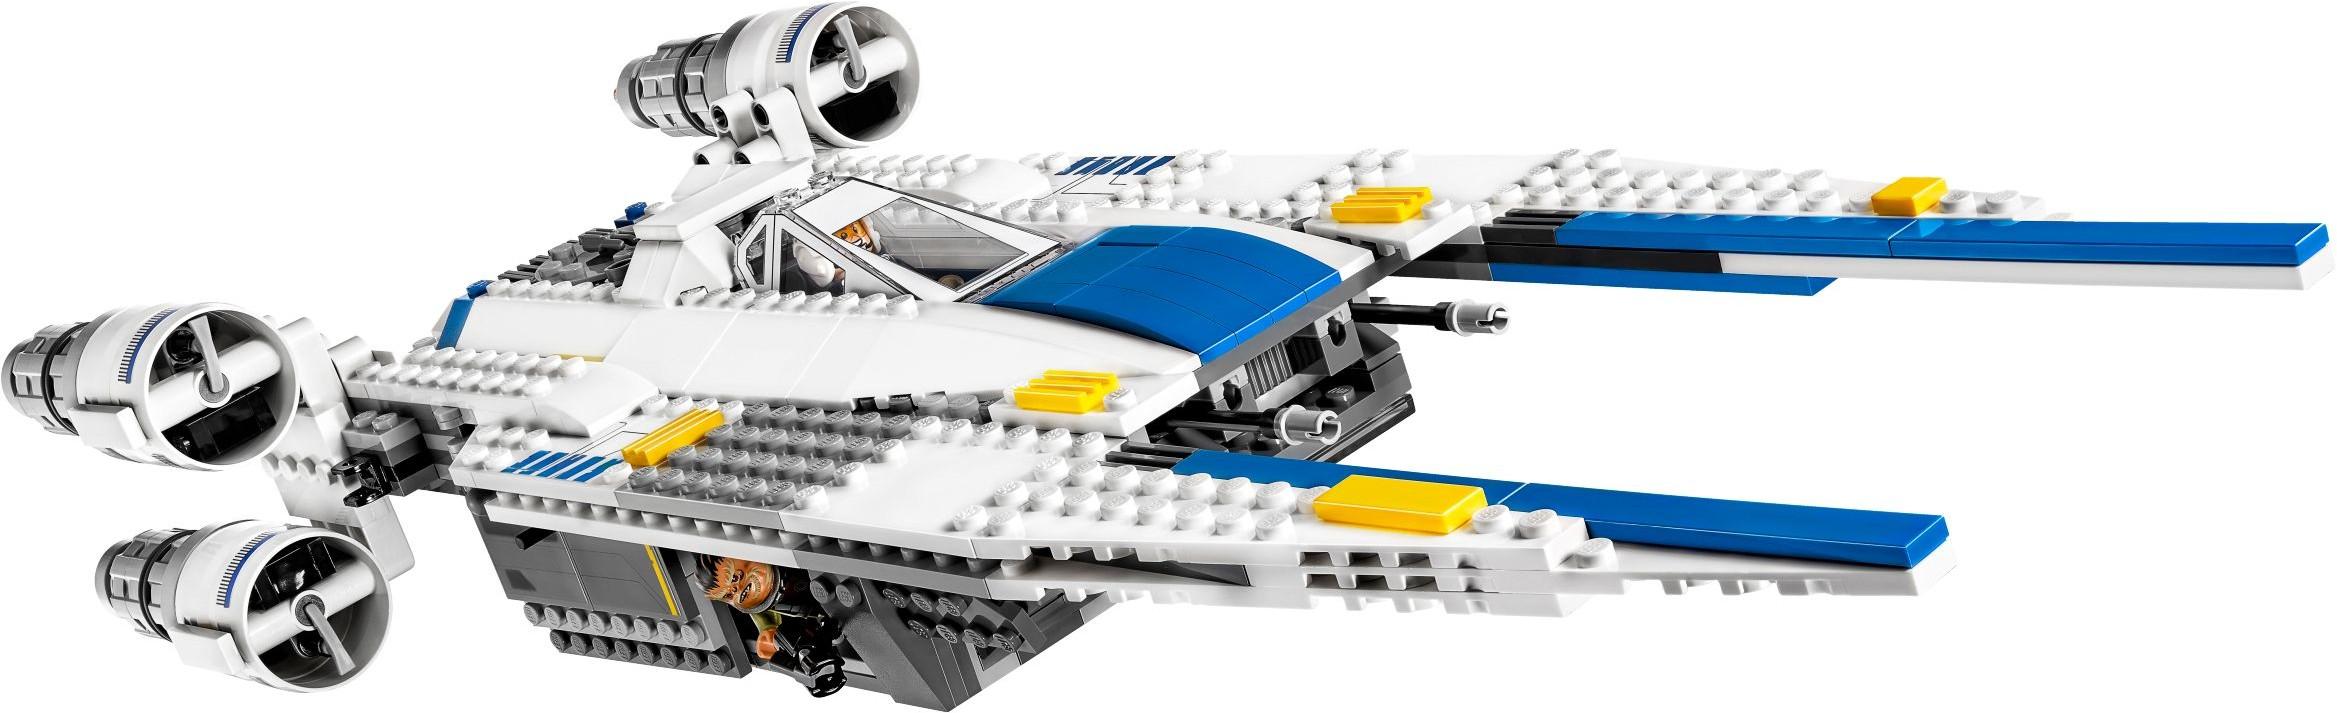 U Wing Lego Rebel 75155 Fighter Owk80PnX